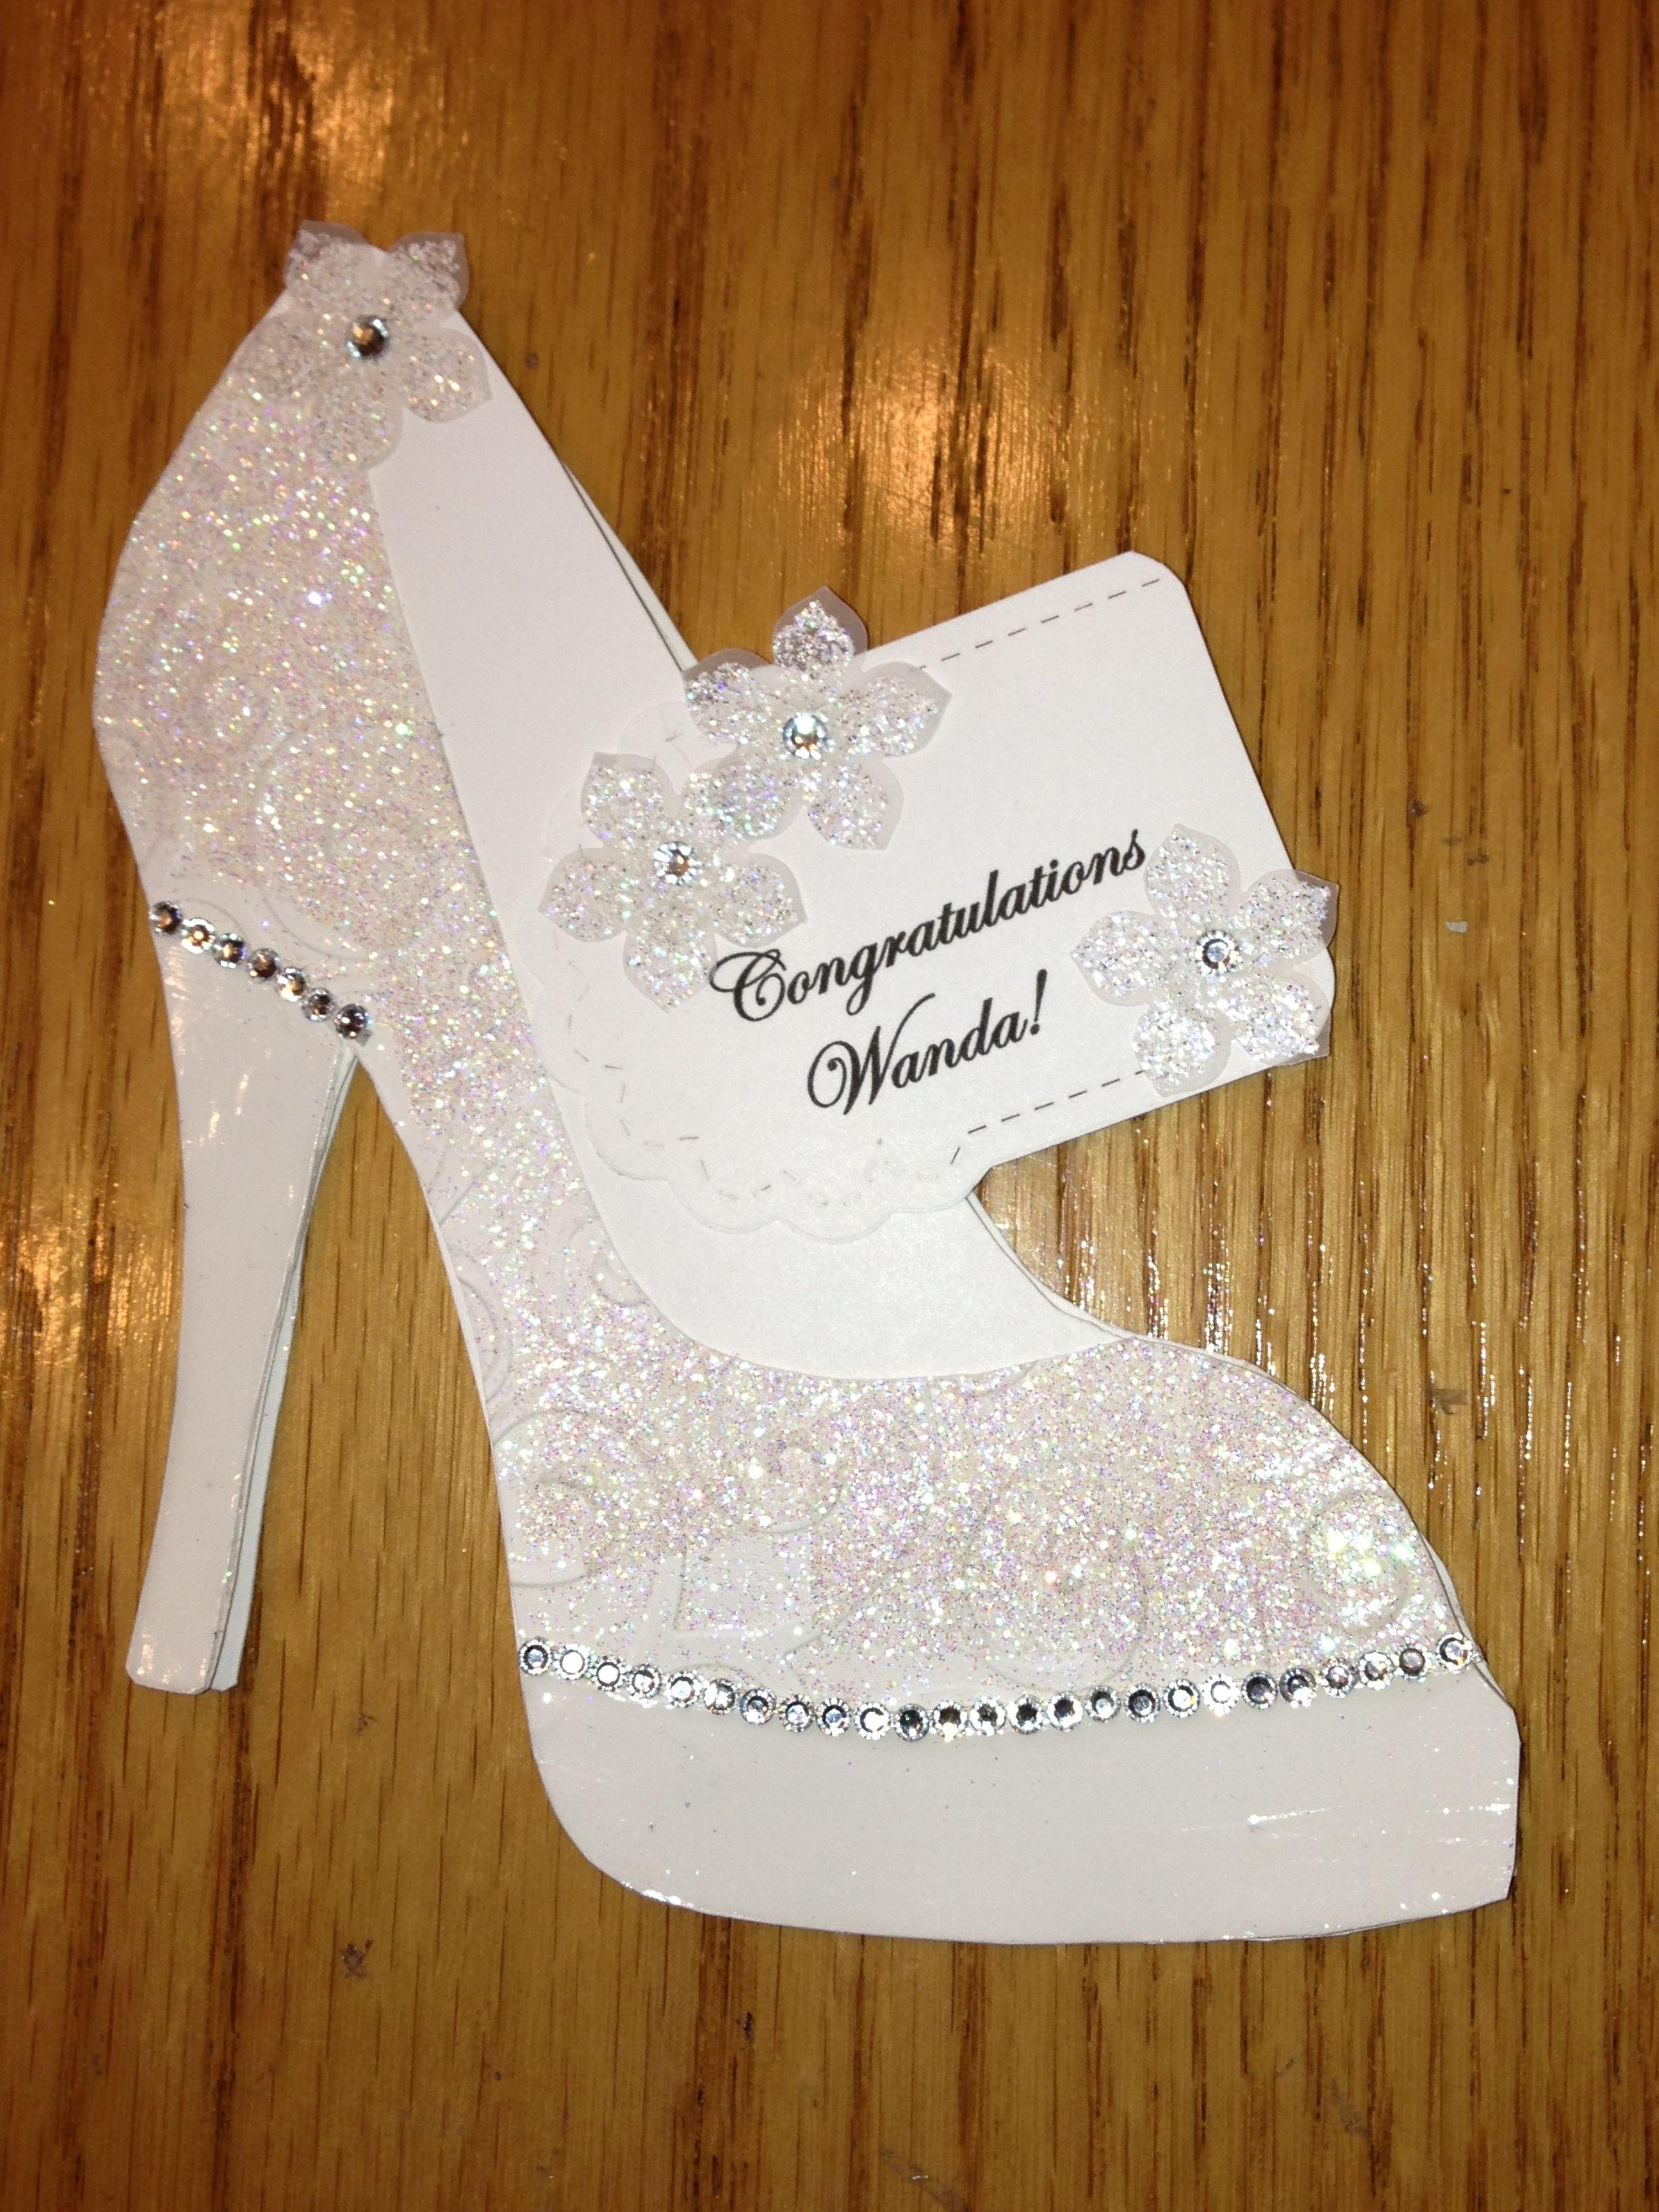 High Heel Shoe Card Bridal Shower Tanya Bell S High Heel Shoe Template Was Used Shoe Template Paper Shoes High Heels